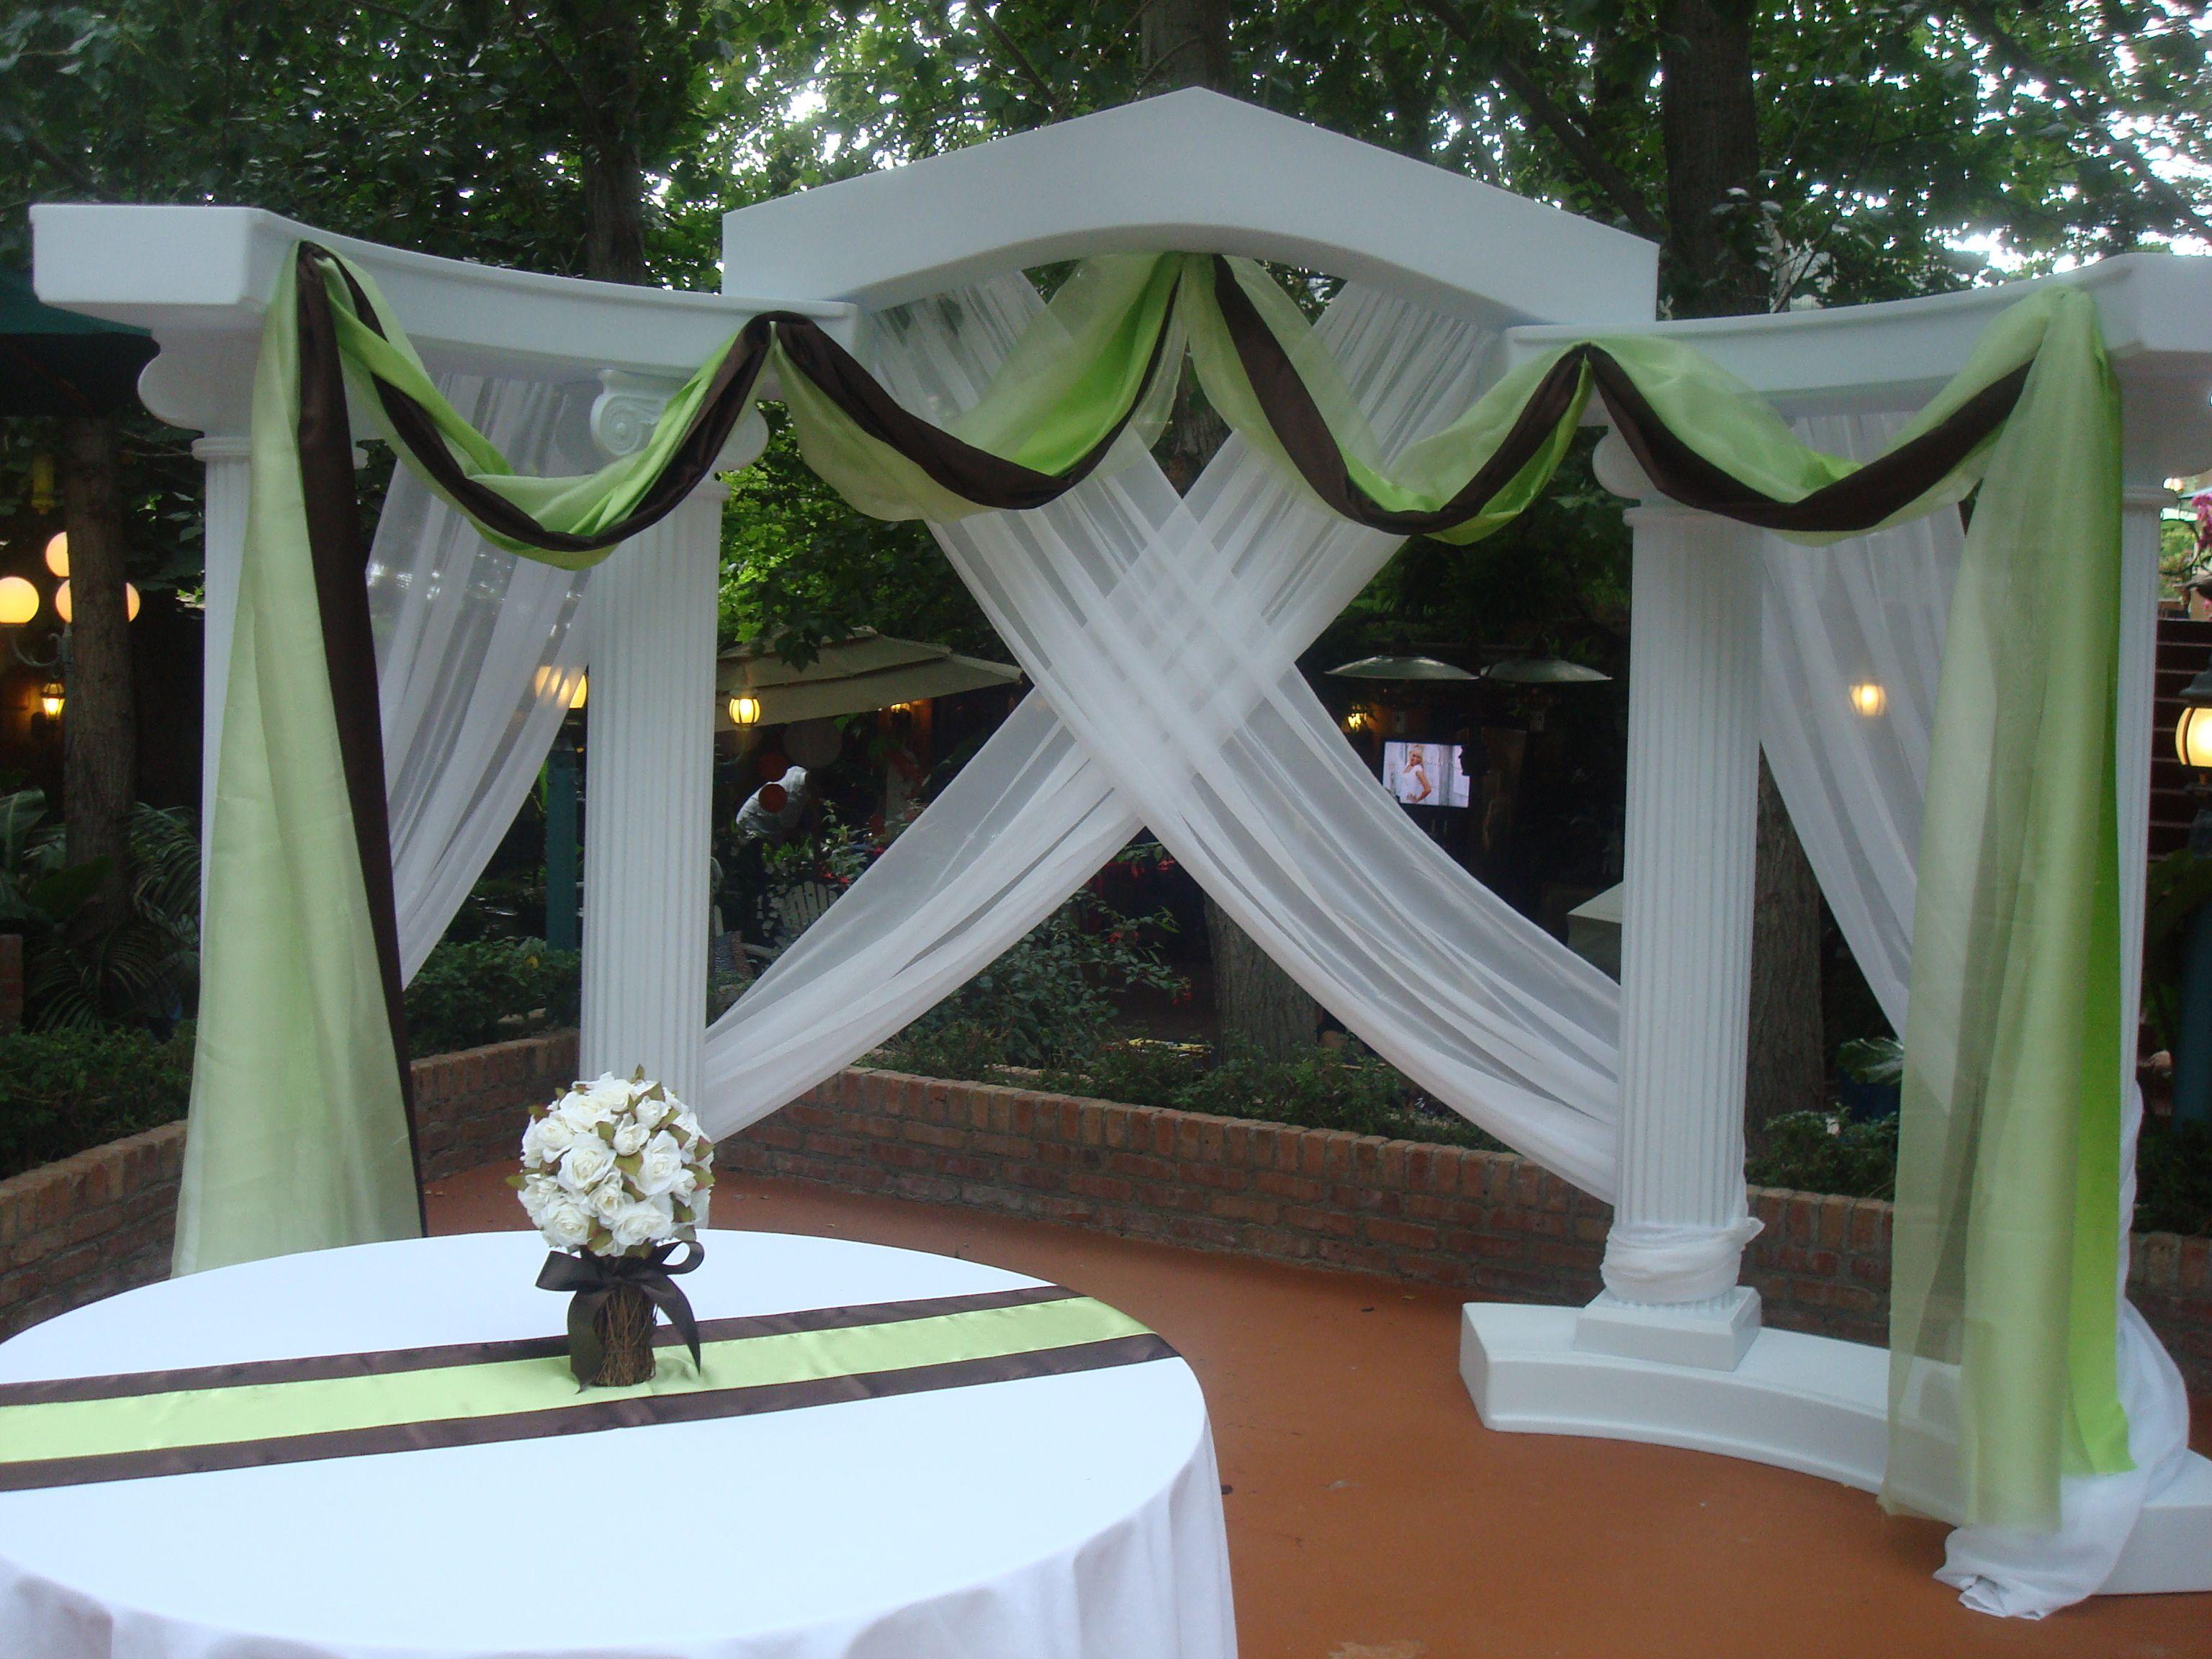 Home Wedding Reception Decoration Ideas Part - 34: Casual Wedding Reception Decorations Wedding Reception Decorations | Simple Home  Decoration Wallpaper